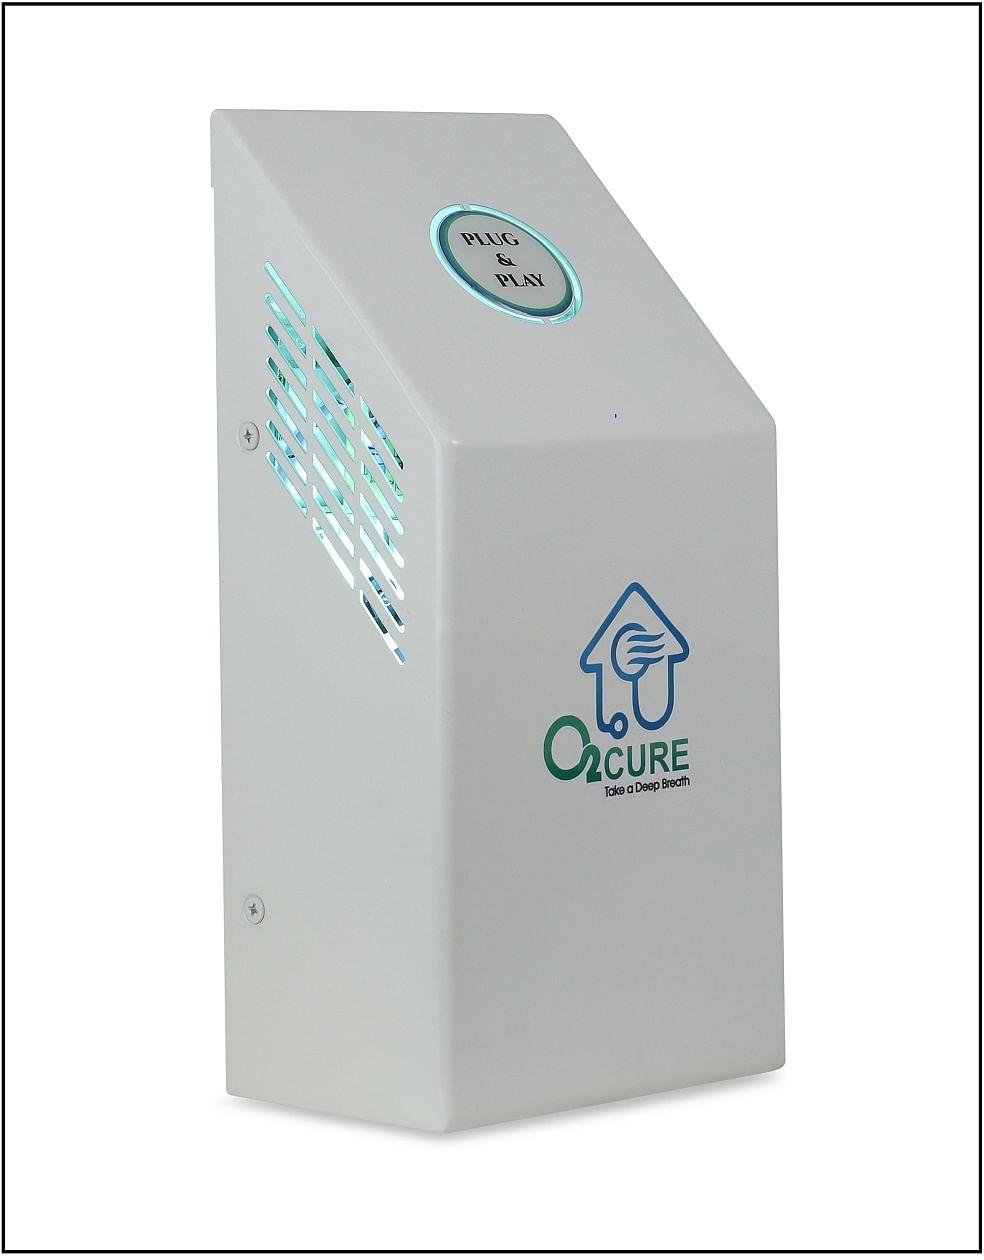 O2 Cure Plug & Play Air Purifier